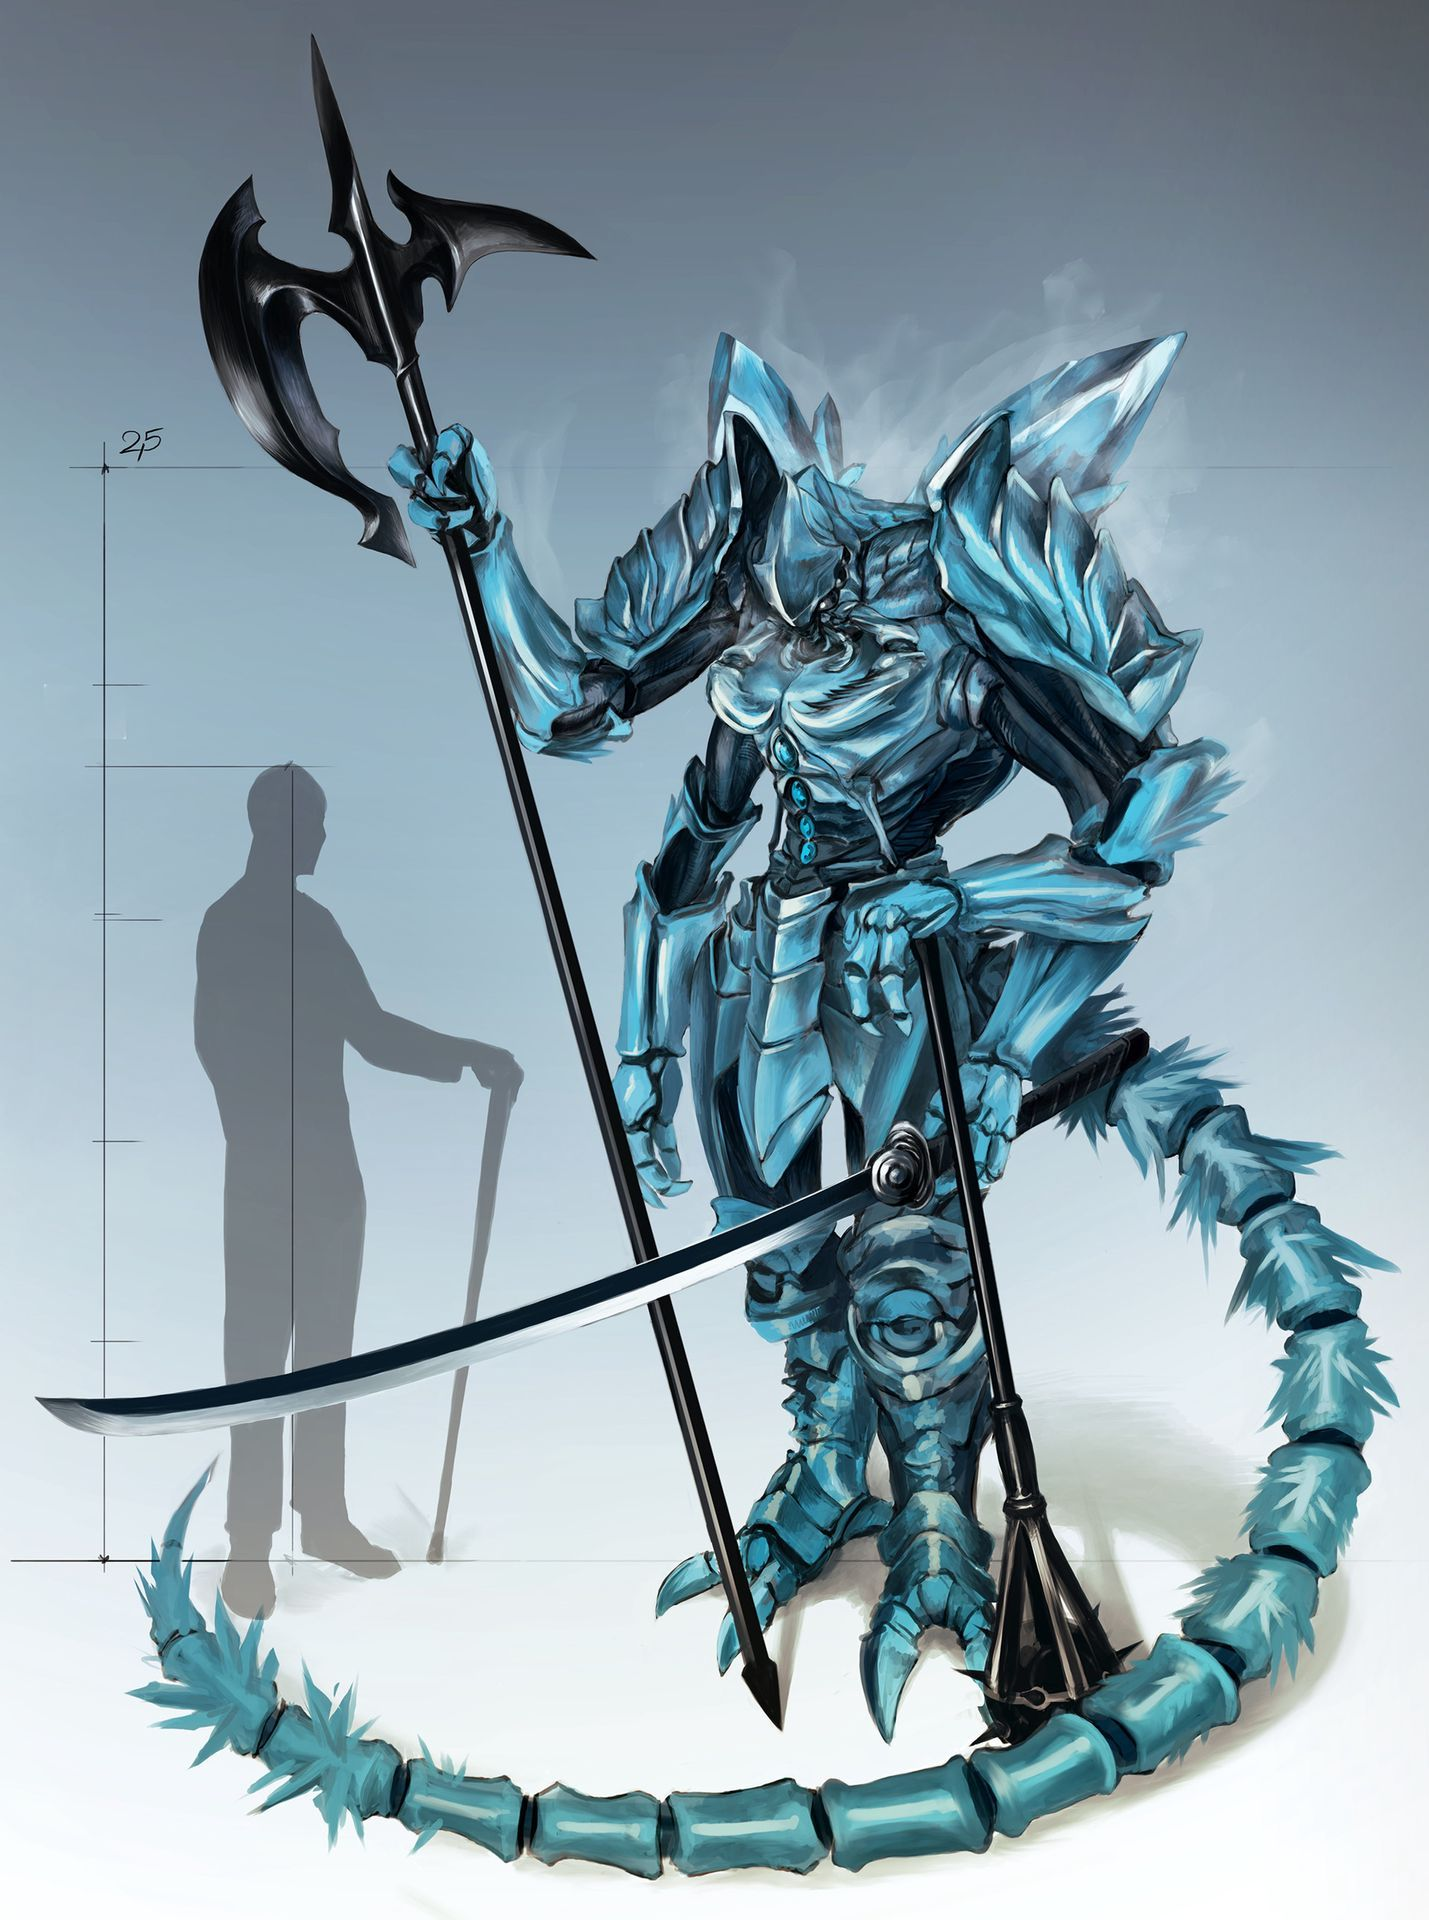 The bard of Nazarick (Isekai+Overlord harem x male reader